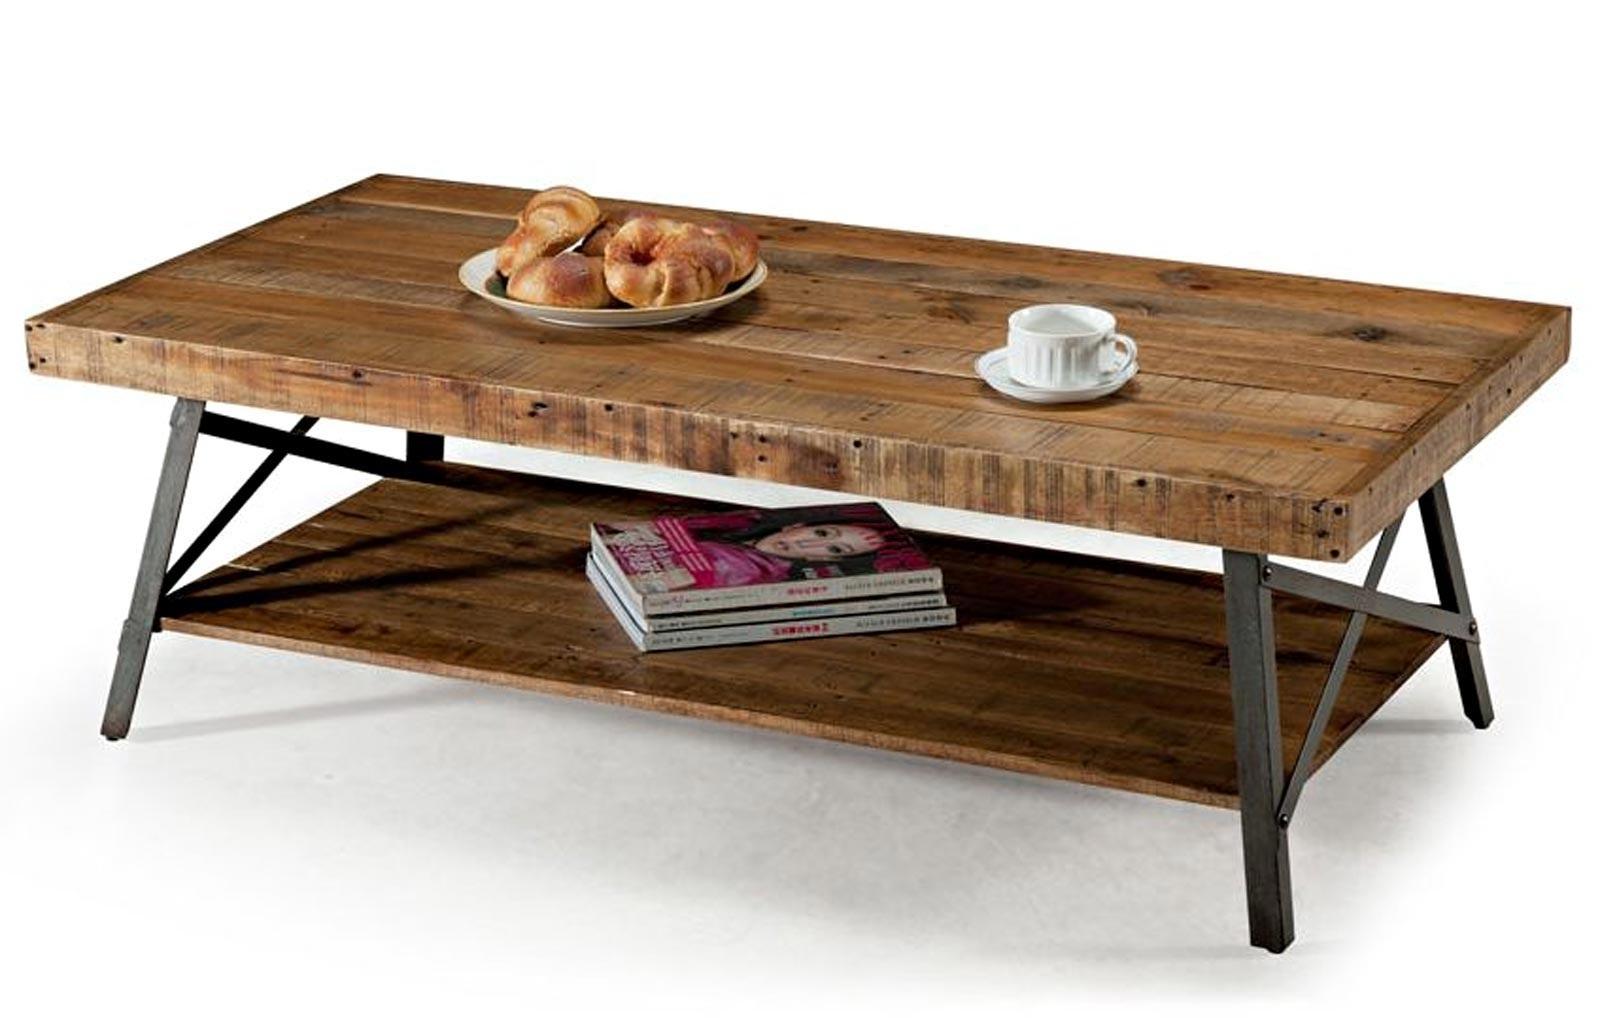 Prepossessing Modern Rustic Coffee Table Laundry Room Concept In For Modern Rustic Coffee Tables (Photo 11 of 30)